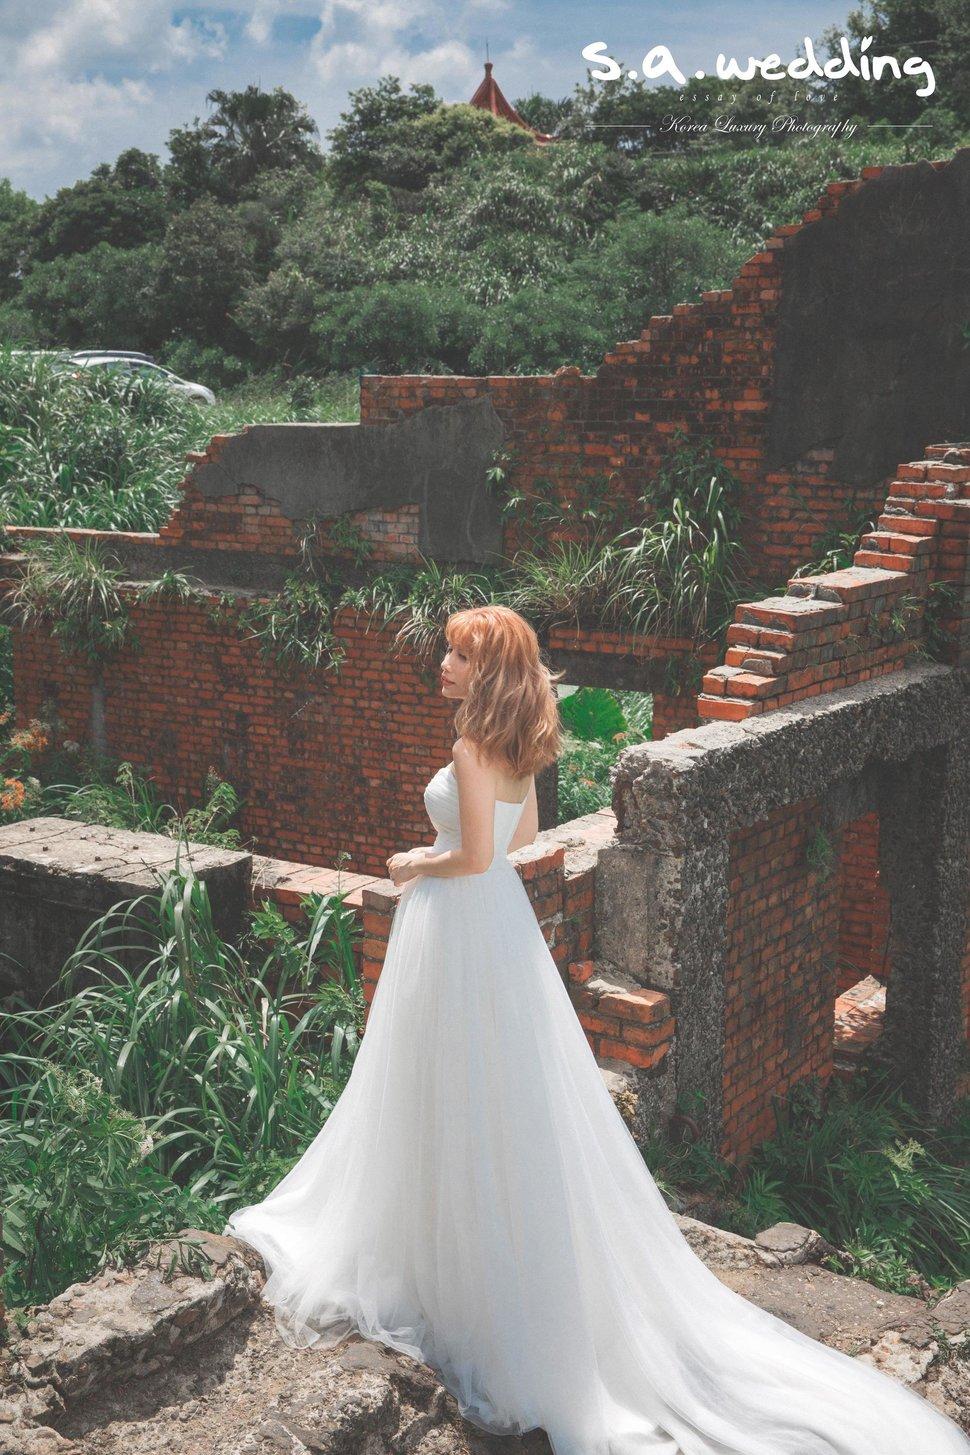 NSH_1262_ps (Copy) - s.a. wedding 韓國婚紗攝影《結婚吧》